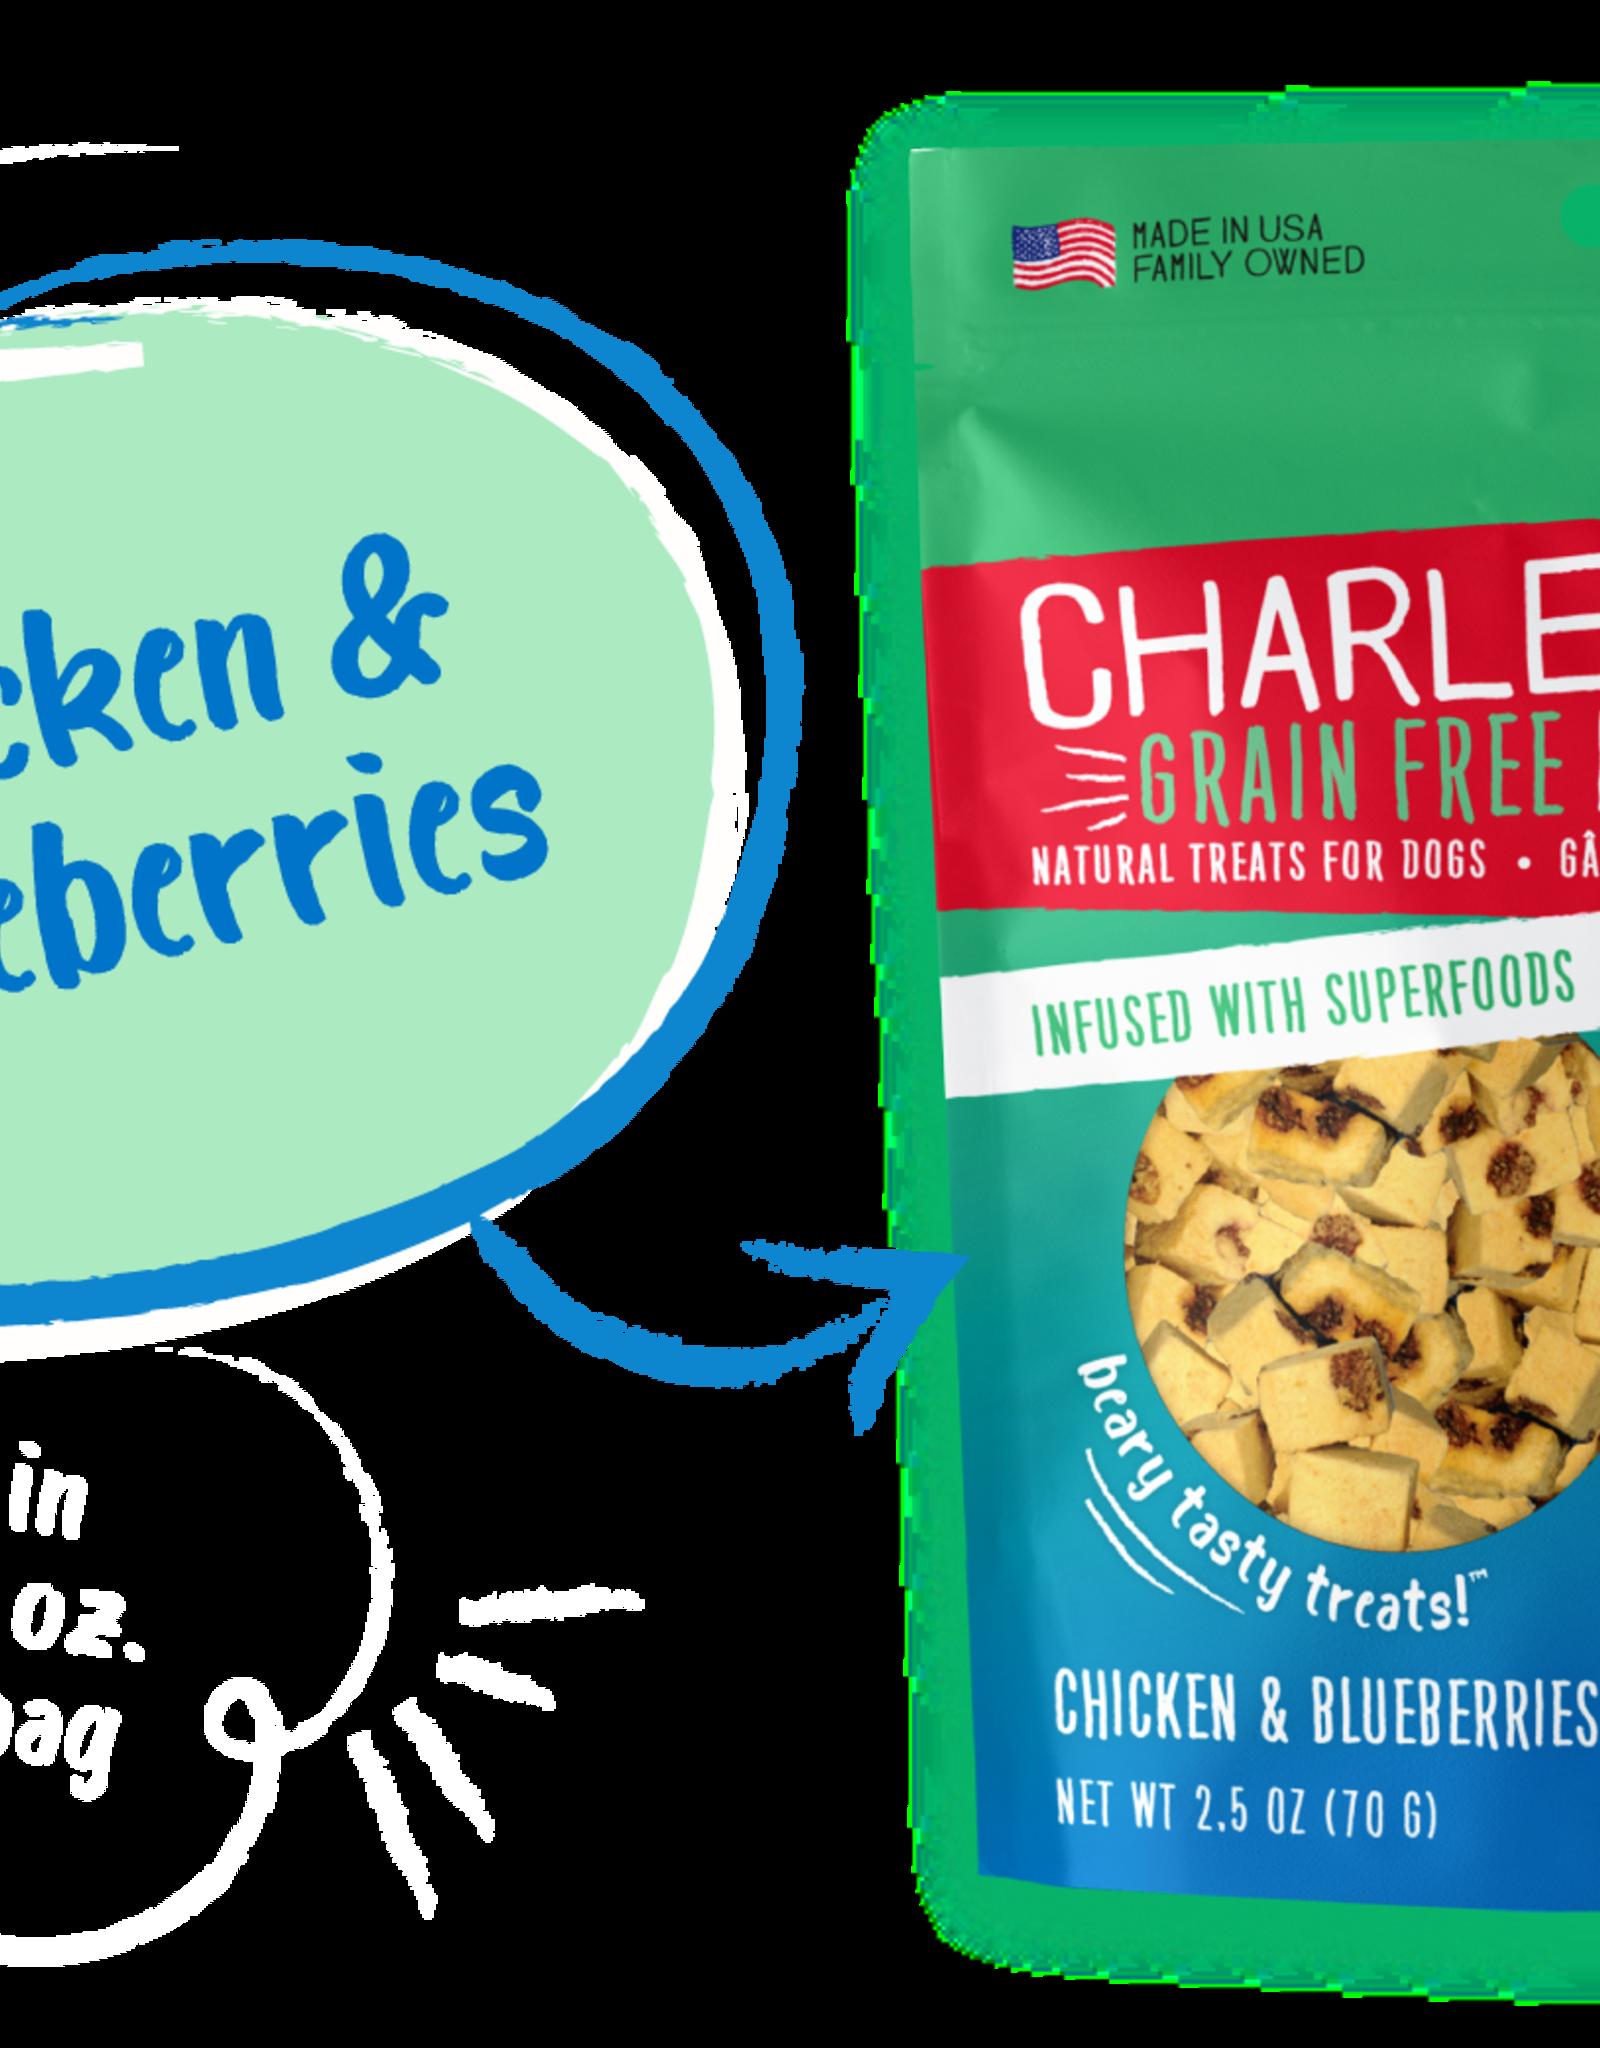 CHARLEE BEAR CHARLEE BEAR DOG MEATY BITES CHICKEN & BLUEBERRIES 2.5OZ